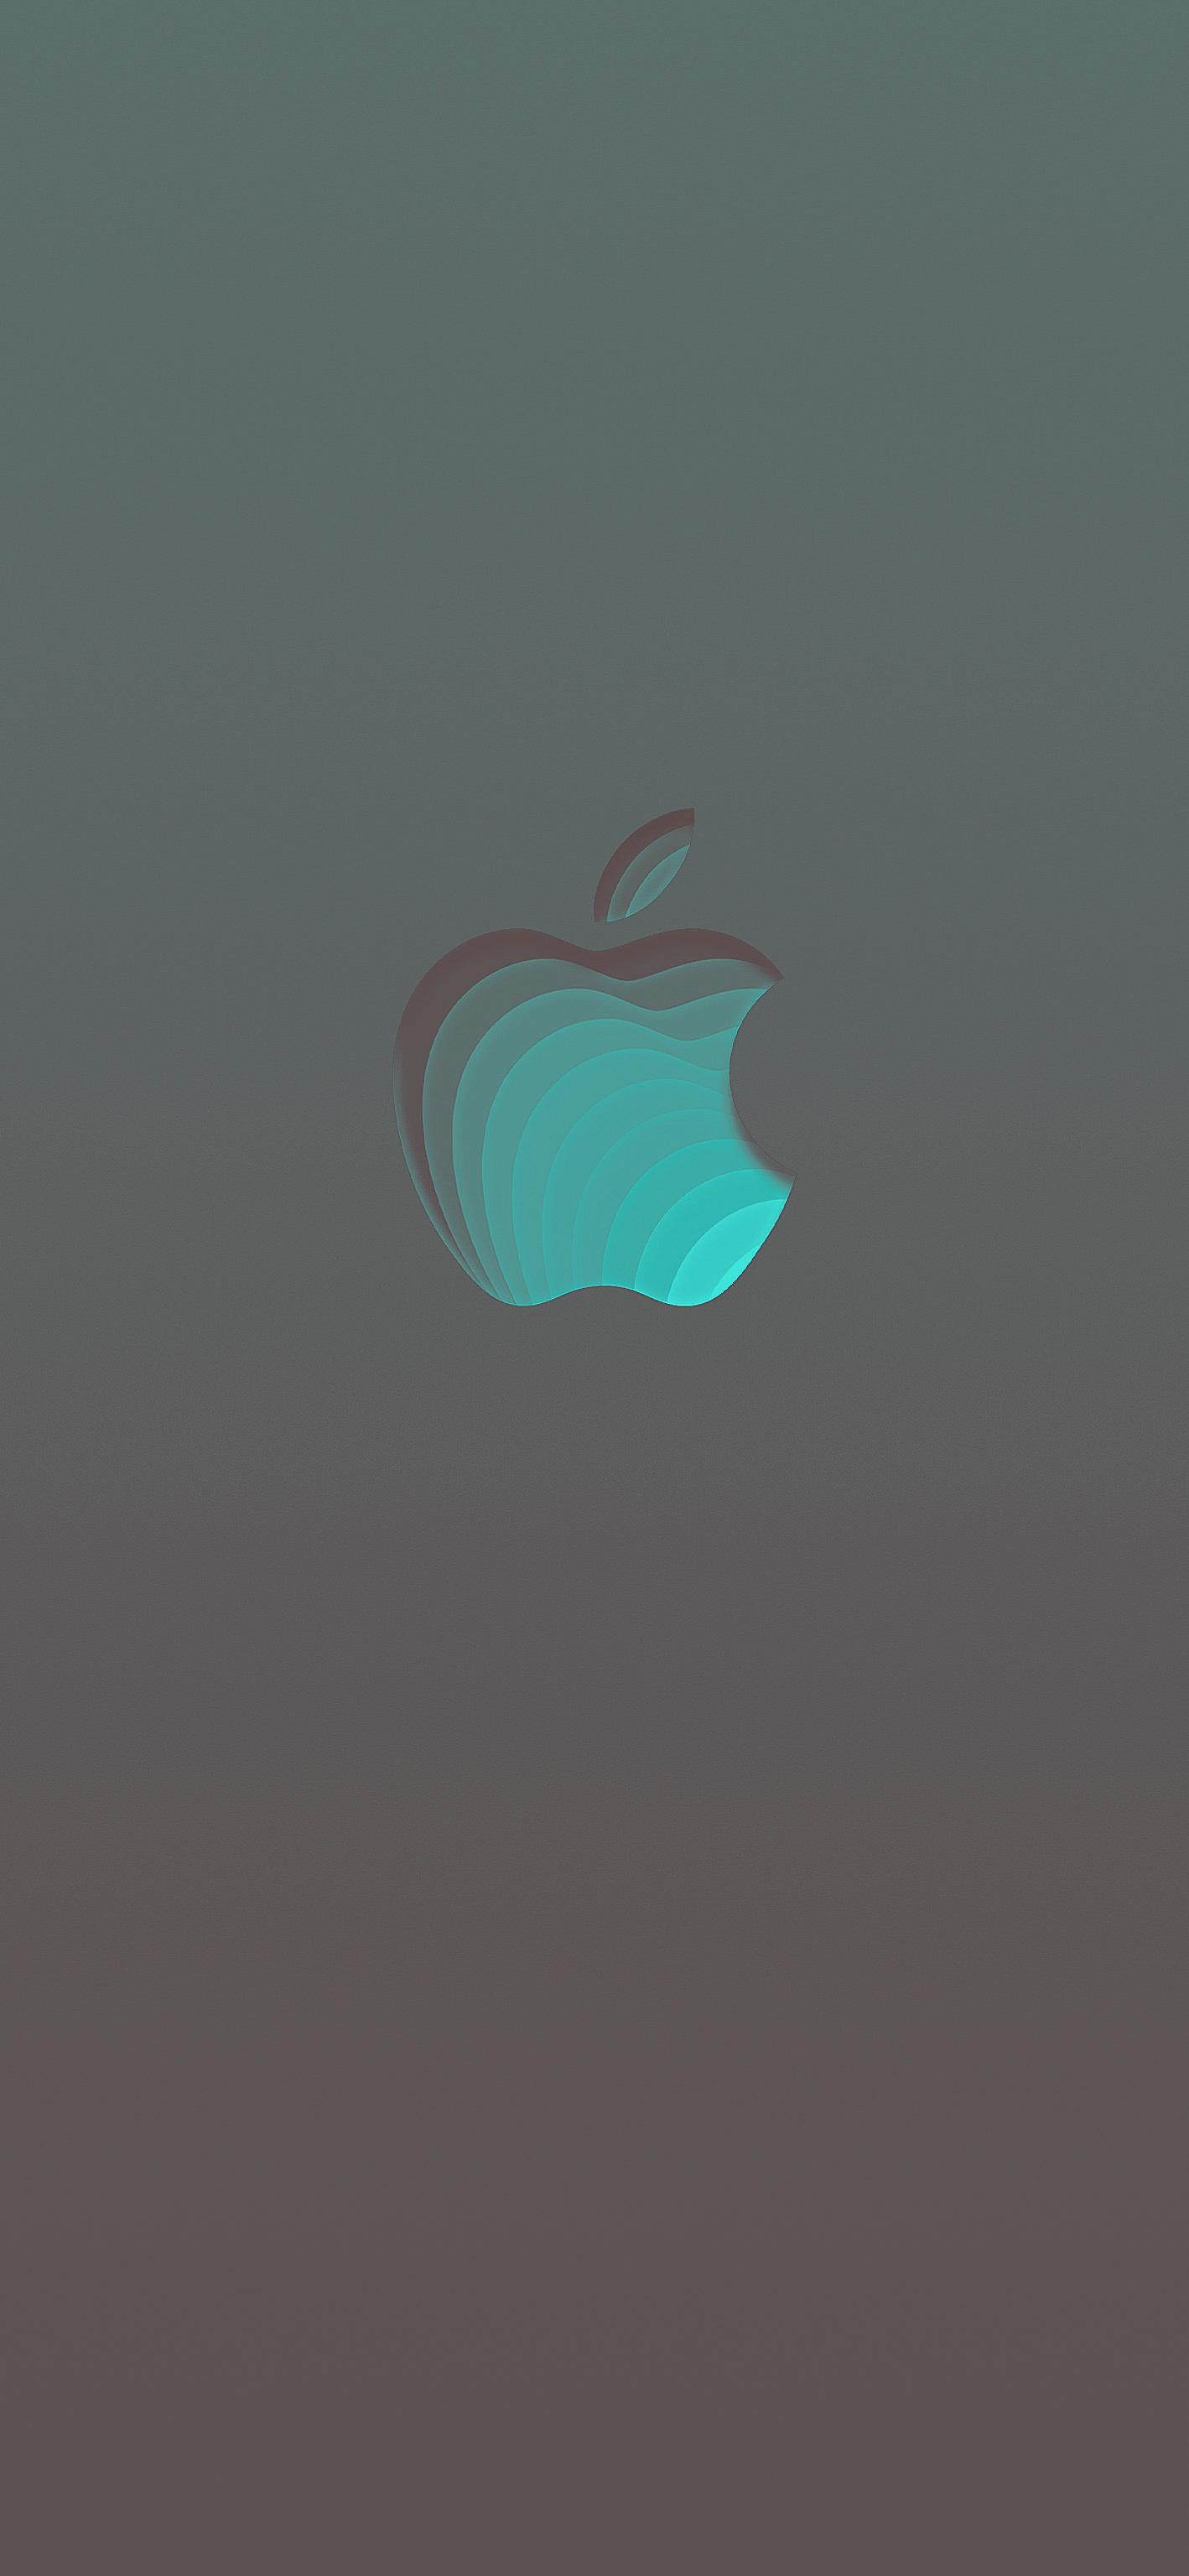 Ios13 Iphonewallpaper Apple Logo Colorful Darkmode Apple Iphone Wallpaper Hd Apple Logo Wallpaper Iphone Apple Wallpaper Iphone